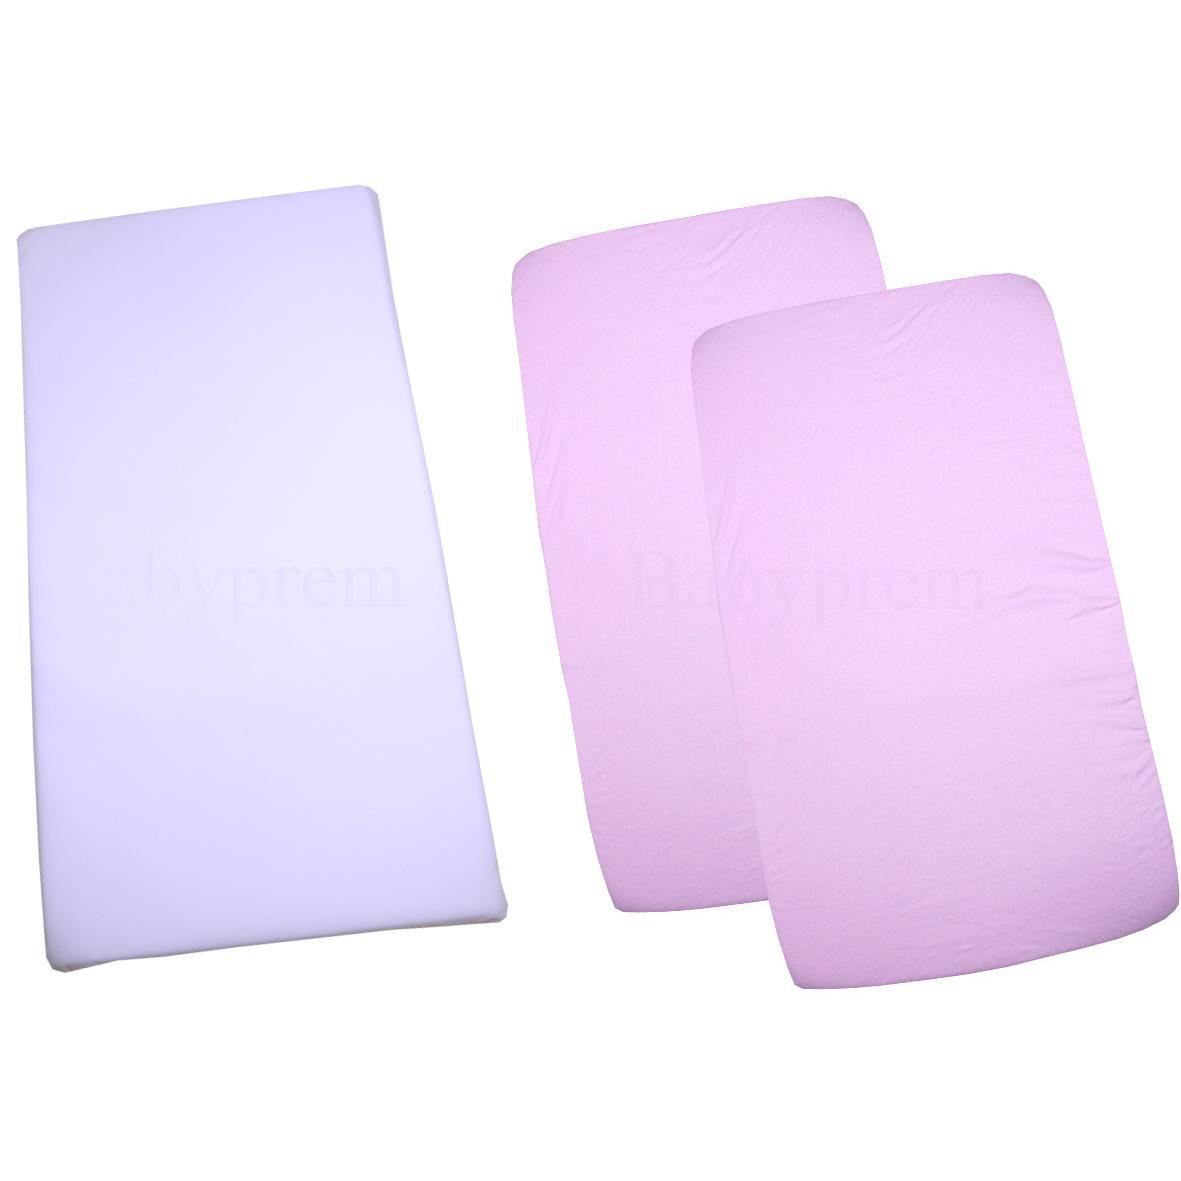 BabyPrem Crib Mattress Set - Mattress & 2 Cotton Fitted Sheets 33 x 17'' Pink